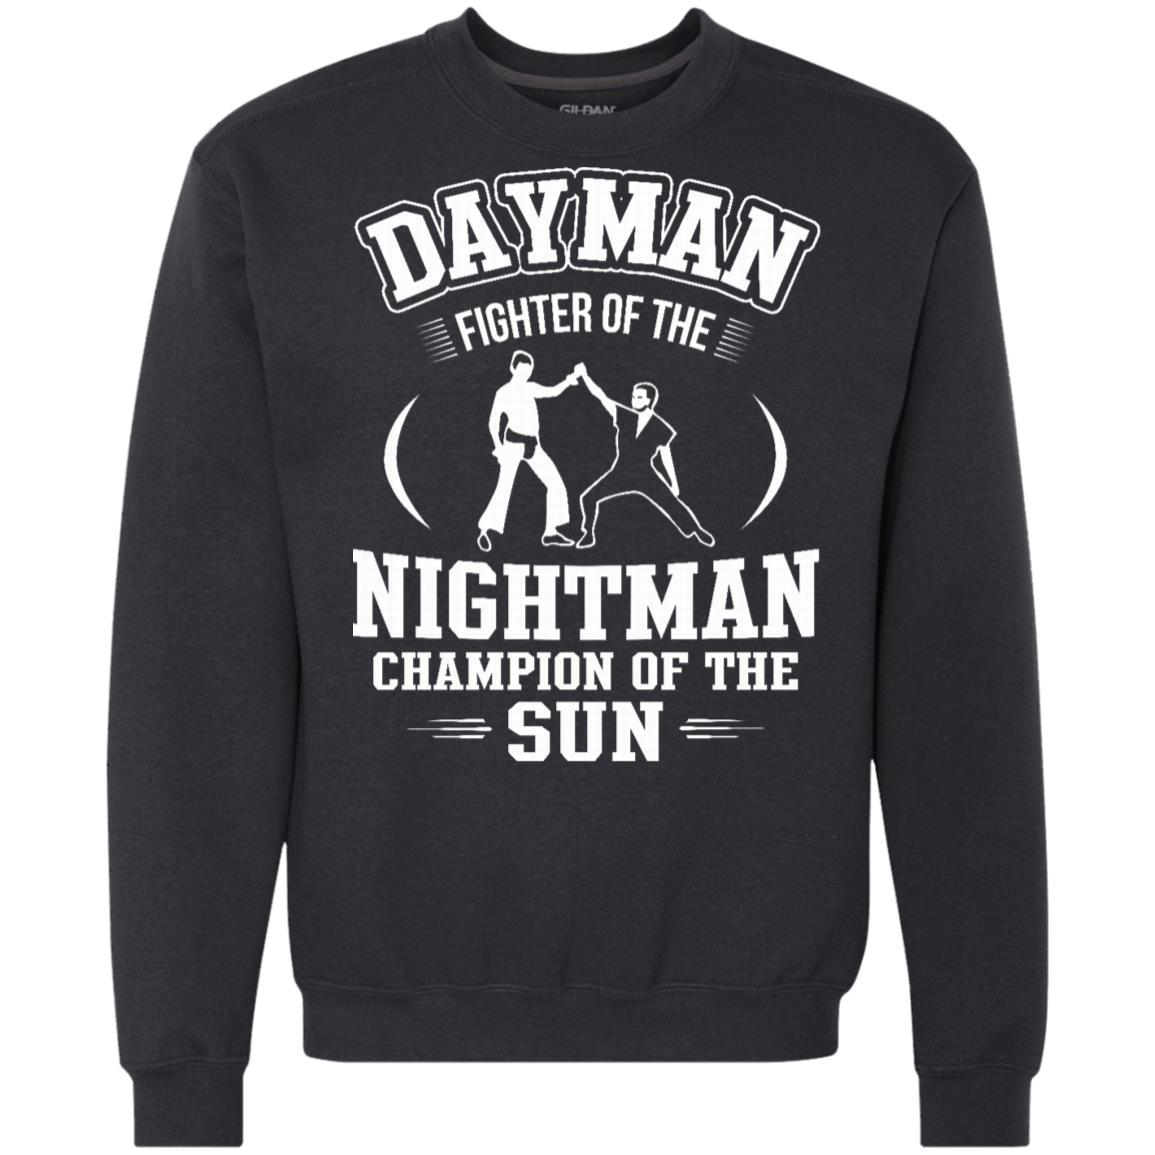 97992ff4 It's Always Sunny In Philadelphia Dayman Fighter Of The Nightman Hoodies  Sweatshirts